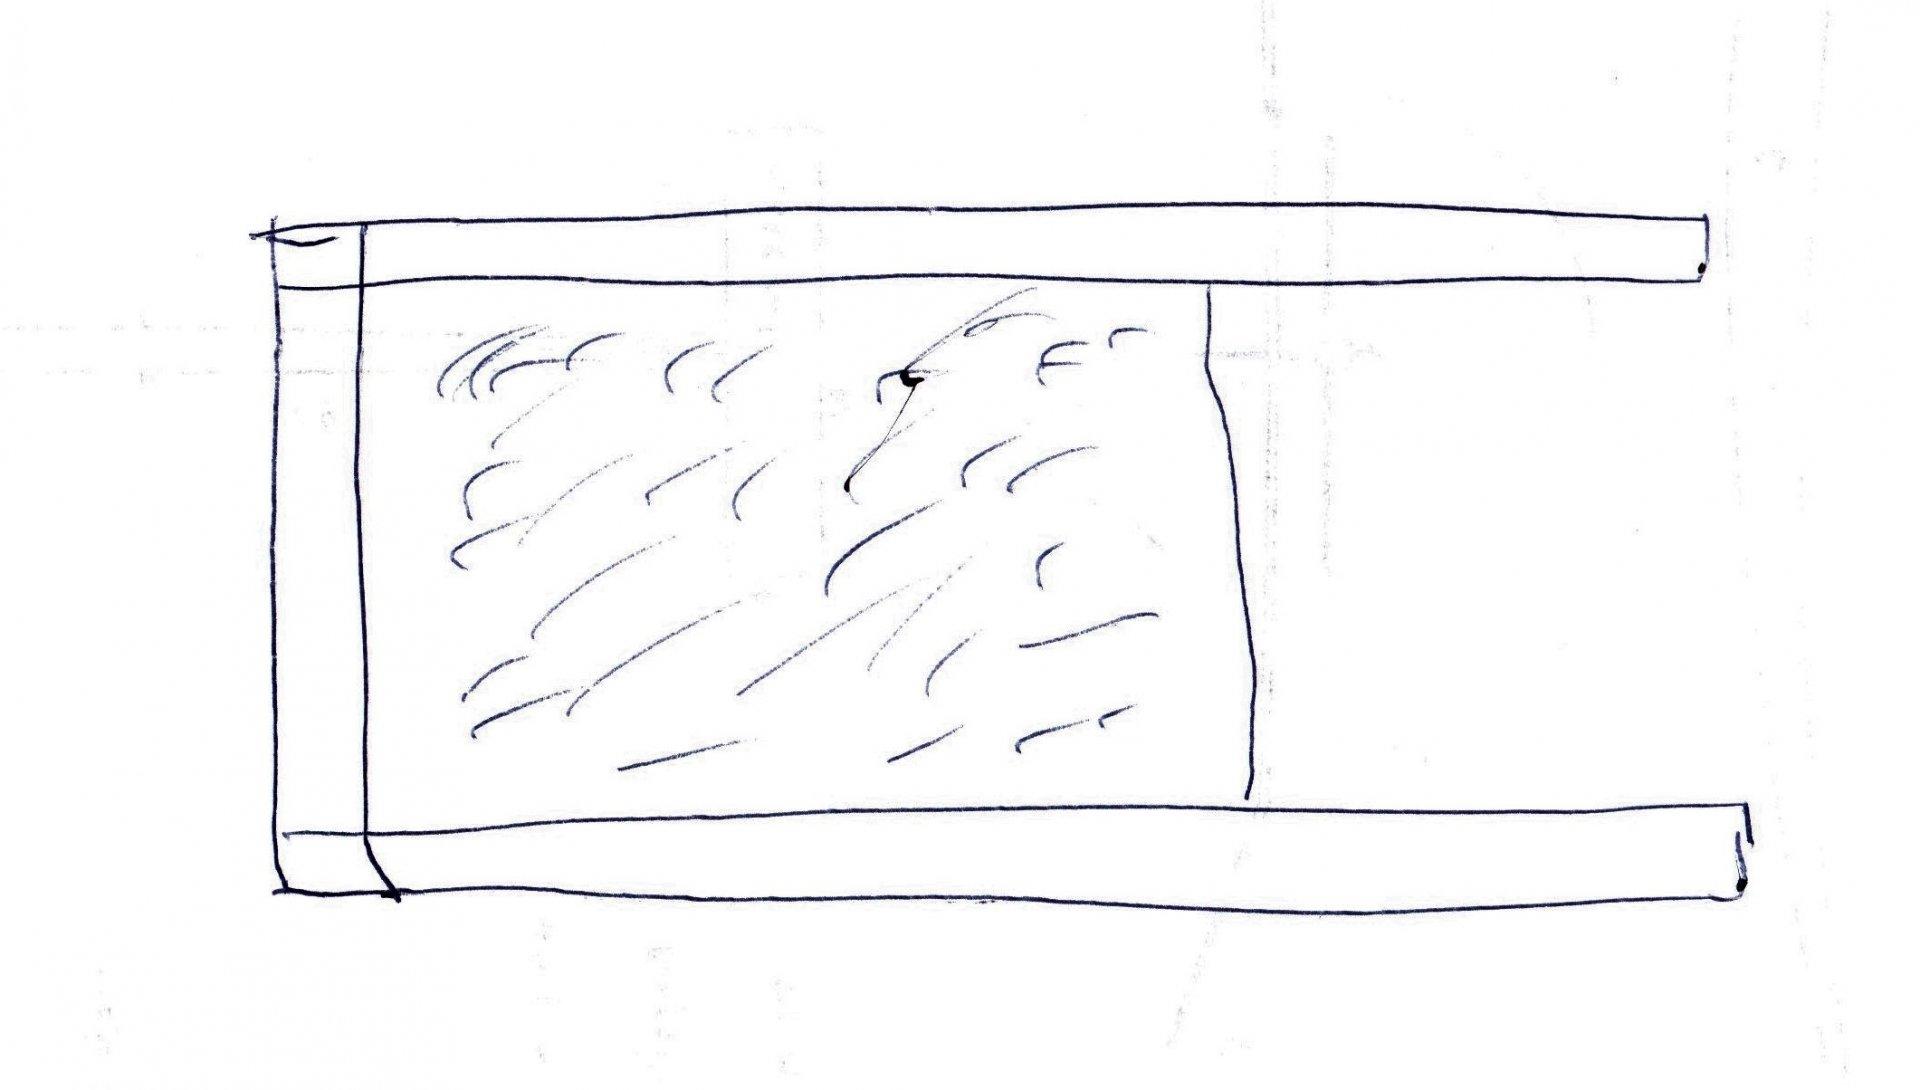 Document_20210503_0001 (3).jpg